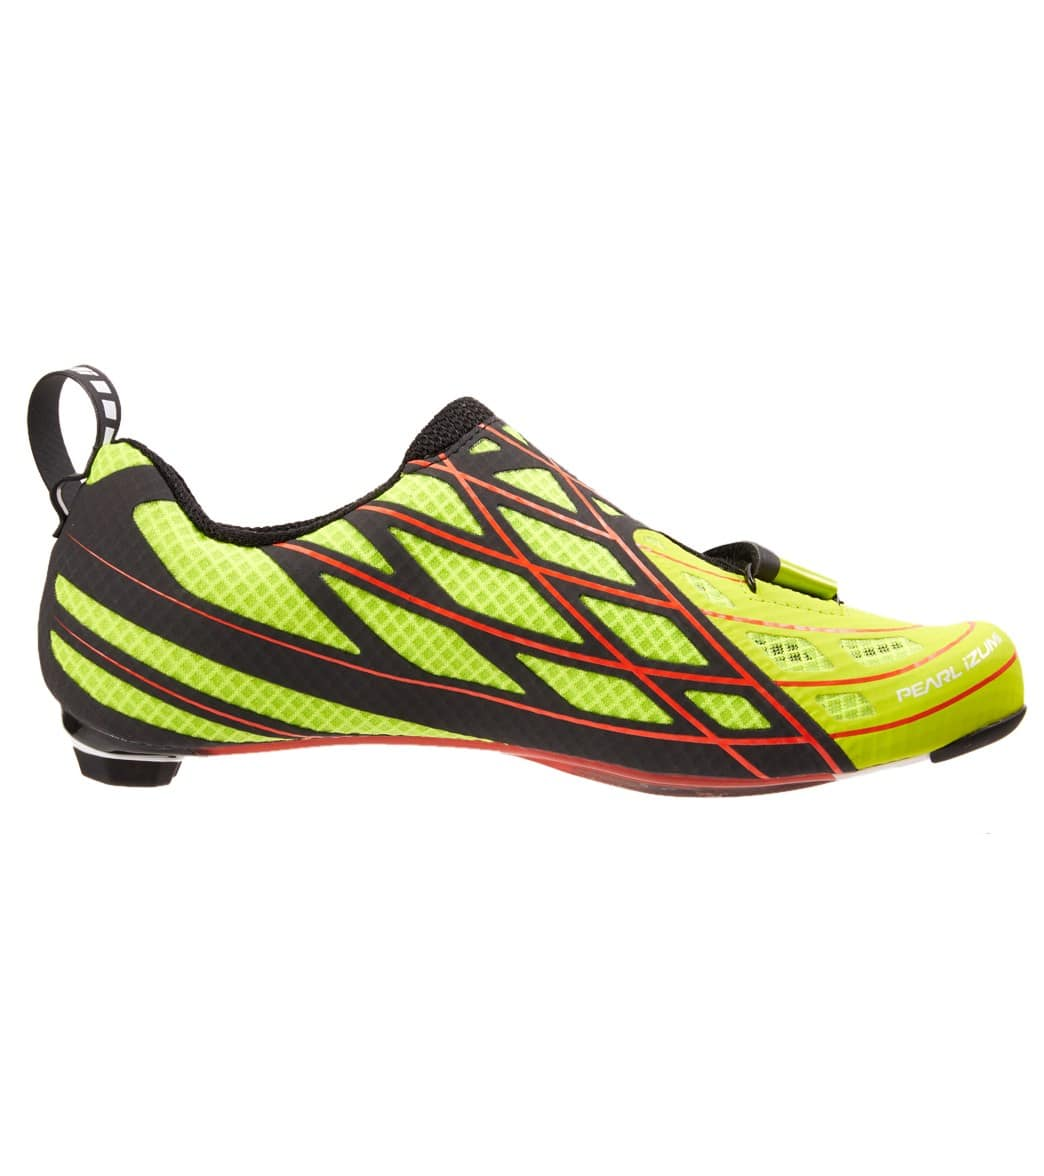 24e5ebfa21ba7 Pearl Izumi Men s Tri Fly Pro v3 Cycling Shoes at SwimOutlet.com ...